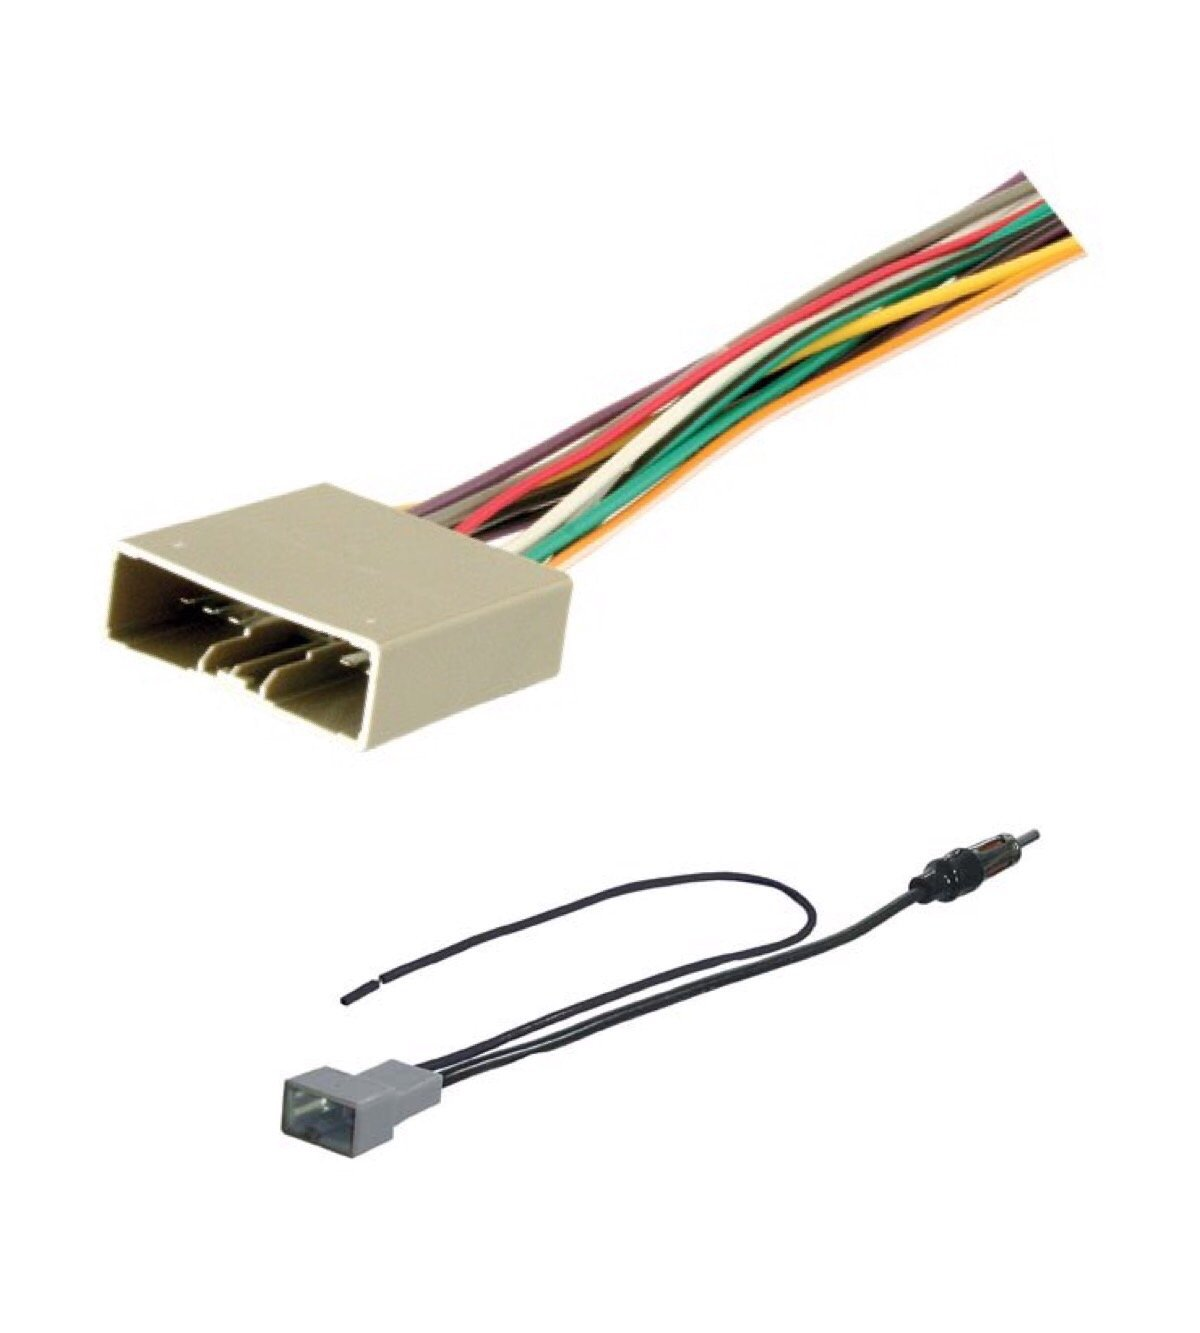 ASC Audio Car Stereo Radio Wire Harness and Antenna Adapter to Aftermarket Radio for 2006-2011 Honda Civic (no Nav, no DX model), 2007-2011 Honda CR-V (no Nav), 2007-2008 Honda Fit, 2008-2010 Odyssey